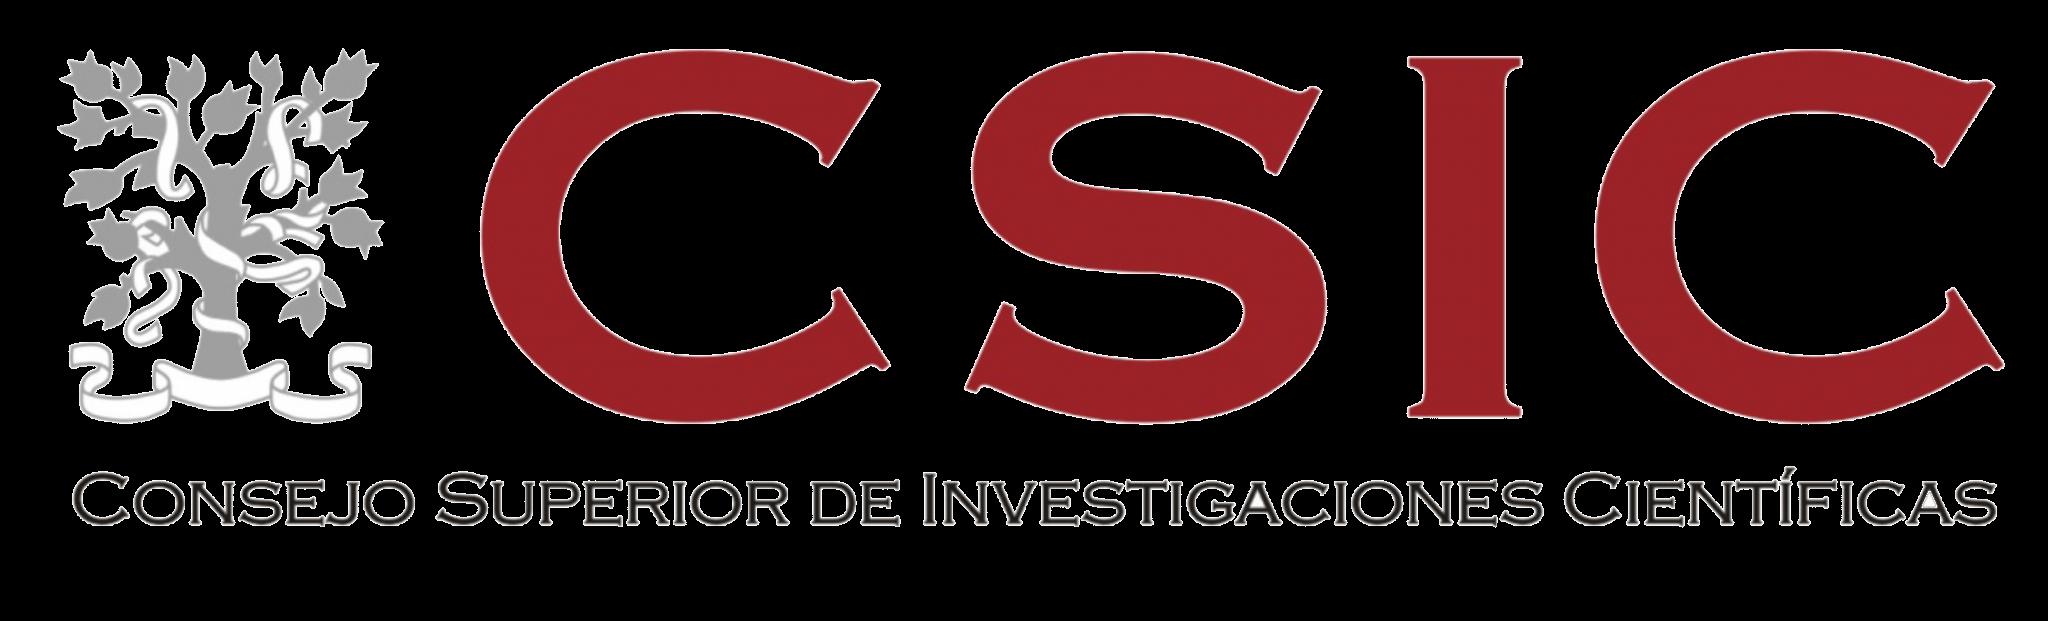 CSIC_logo copy